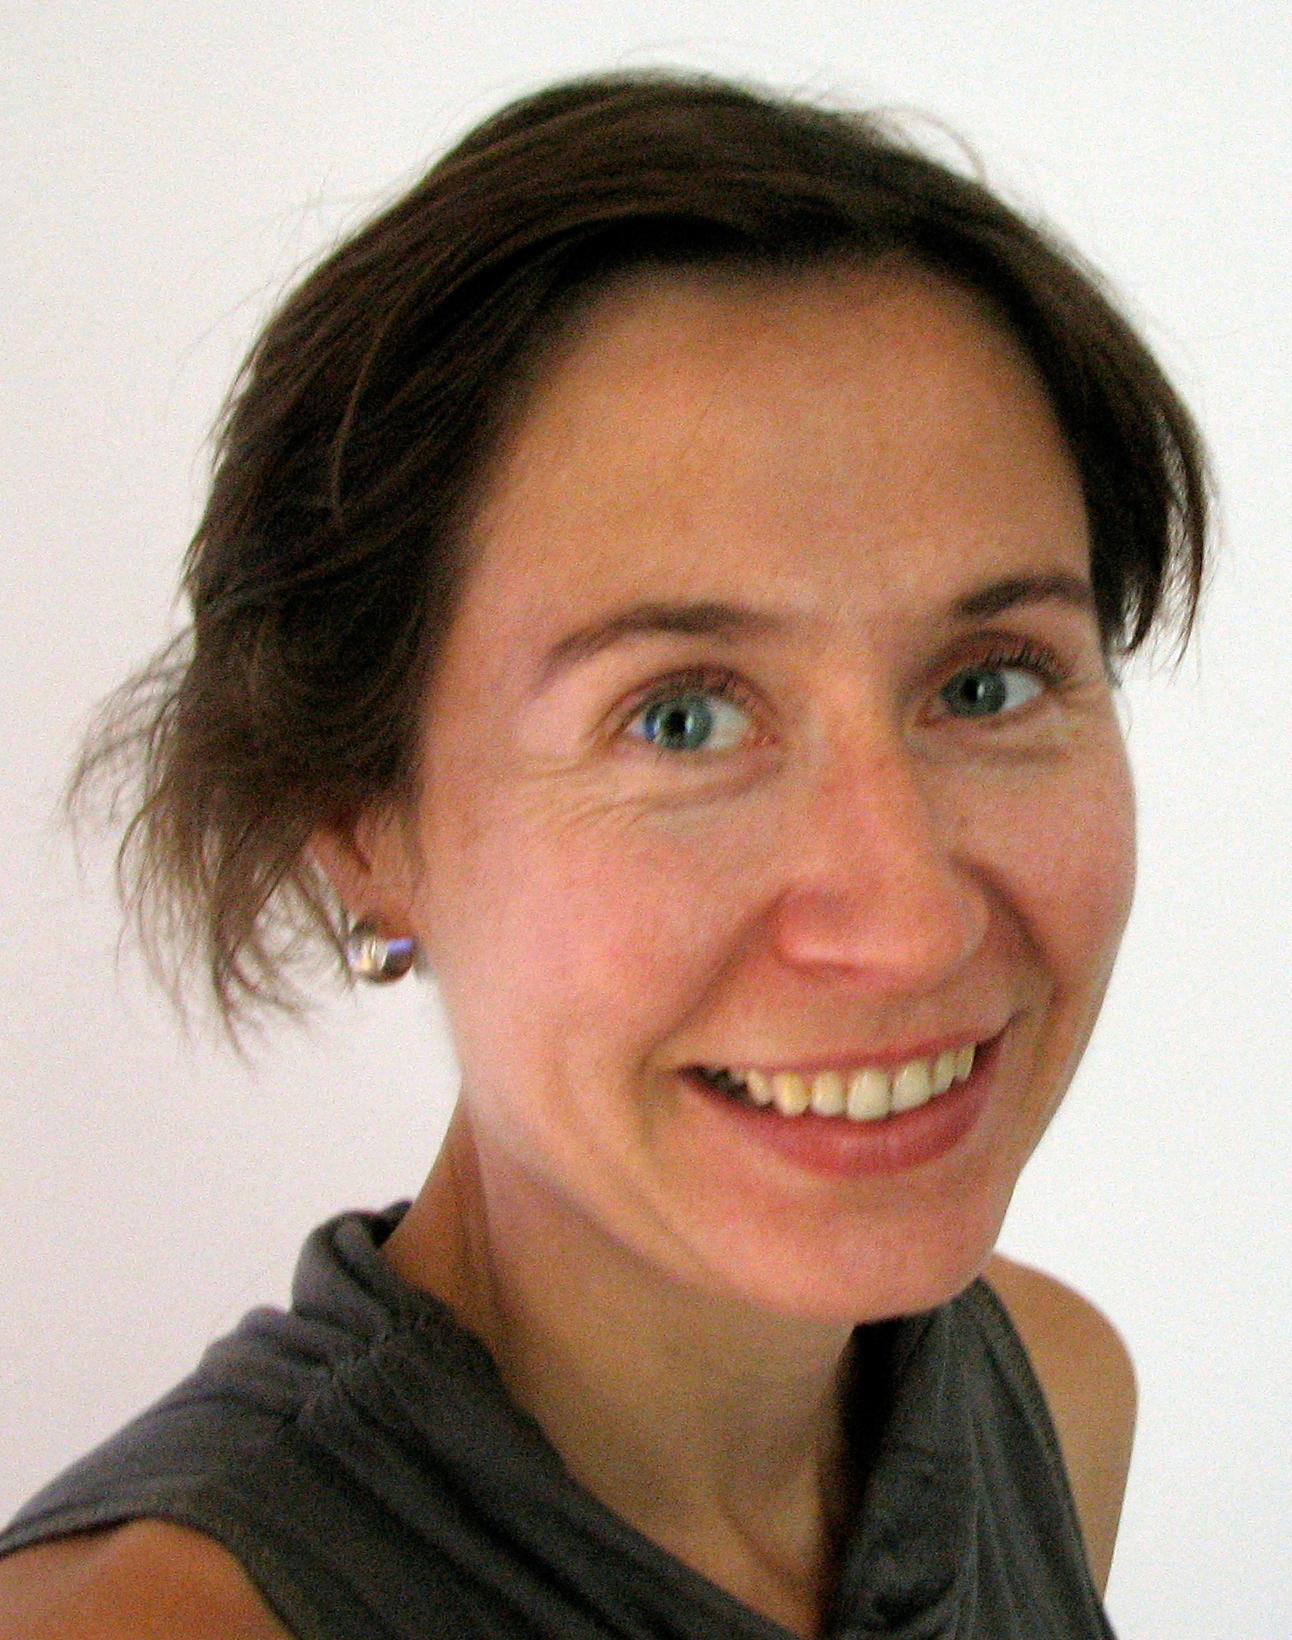 Eventbild für MÜNSTER LECTURES // Joanna Rajkowska, KÜNSTLERIN, London